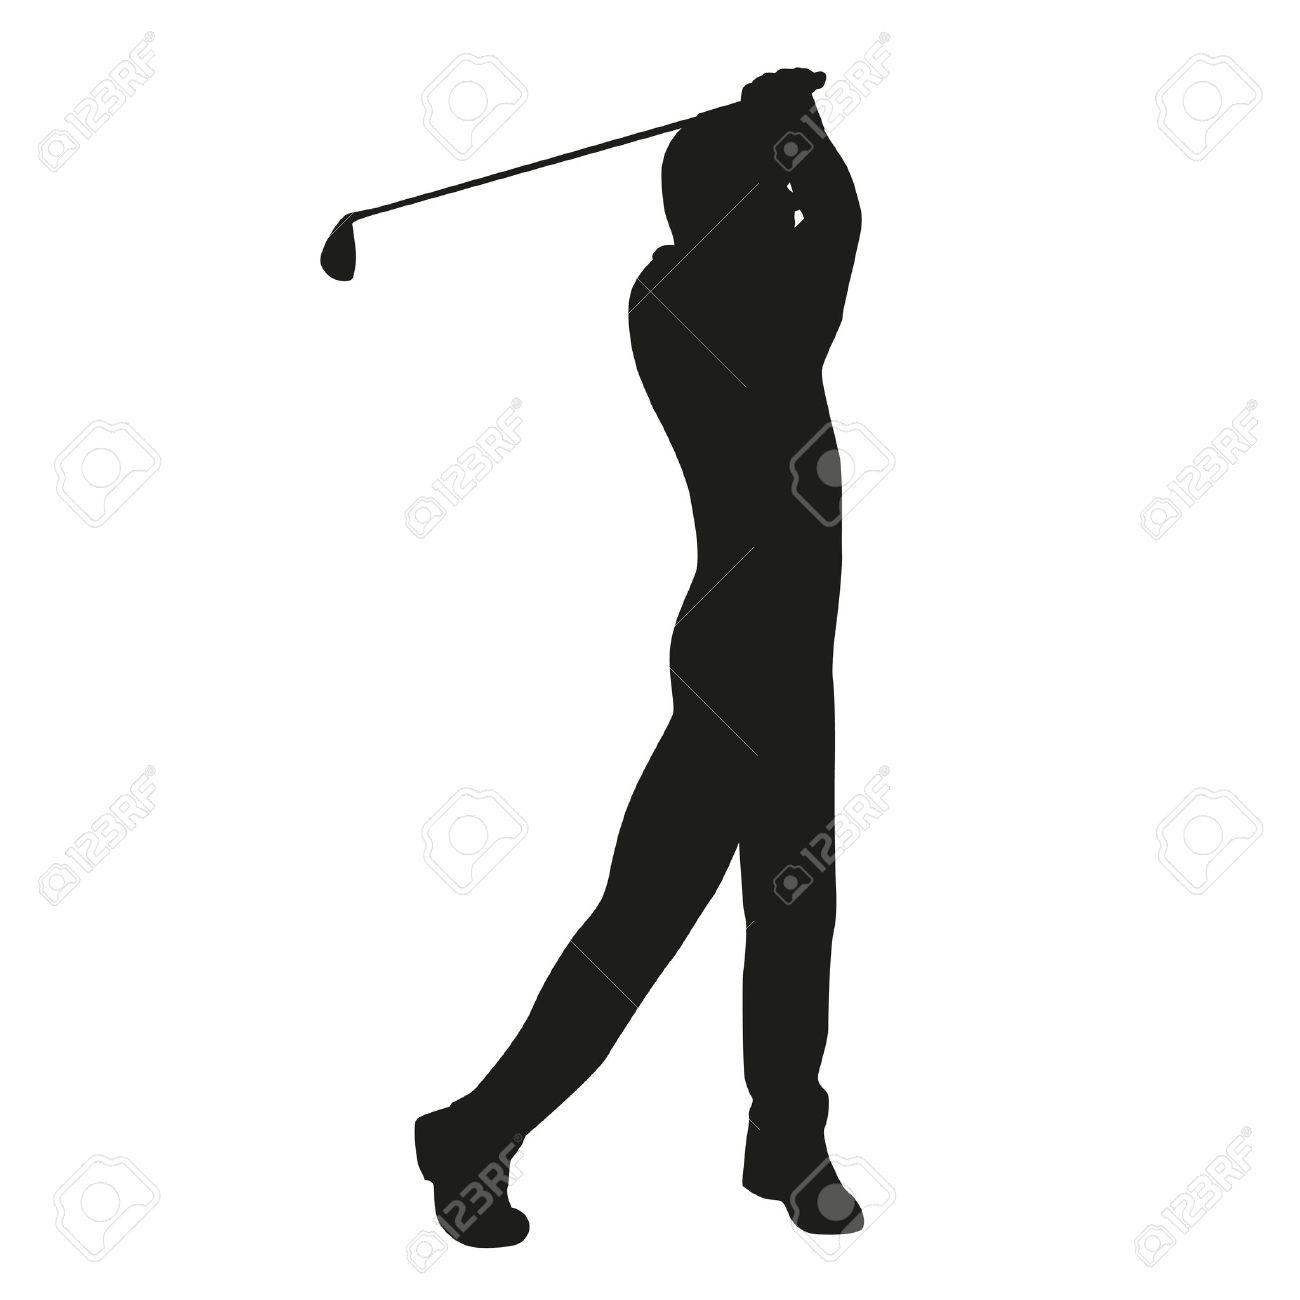 golf swing vector golfer silhouette stock vector 37531515